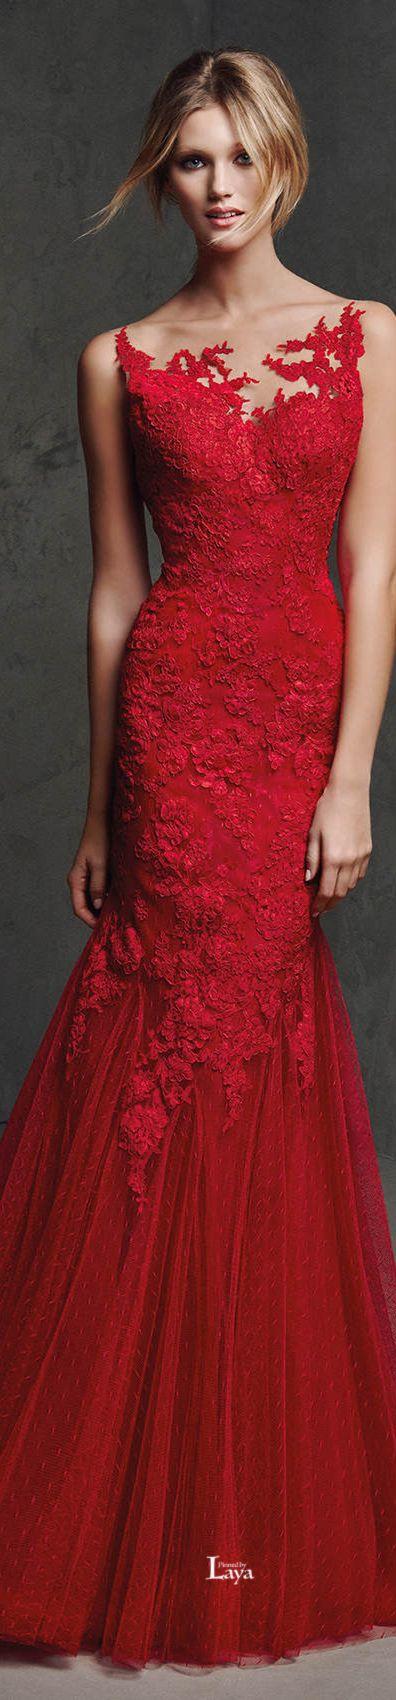 LUCLUC White Sweetheart Ruched Dyeing Dress | Kleider, Abendkleider ...